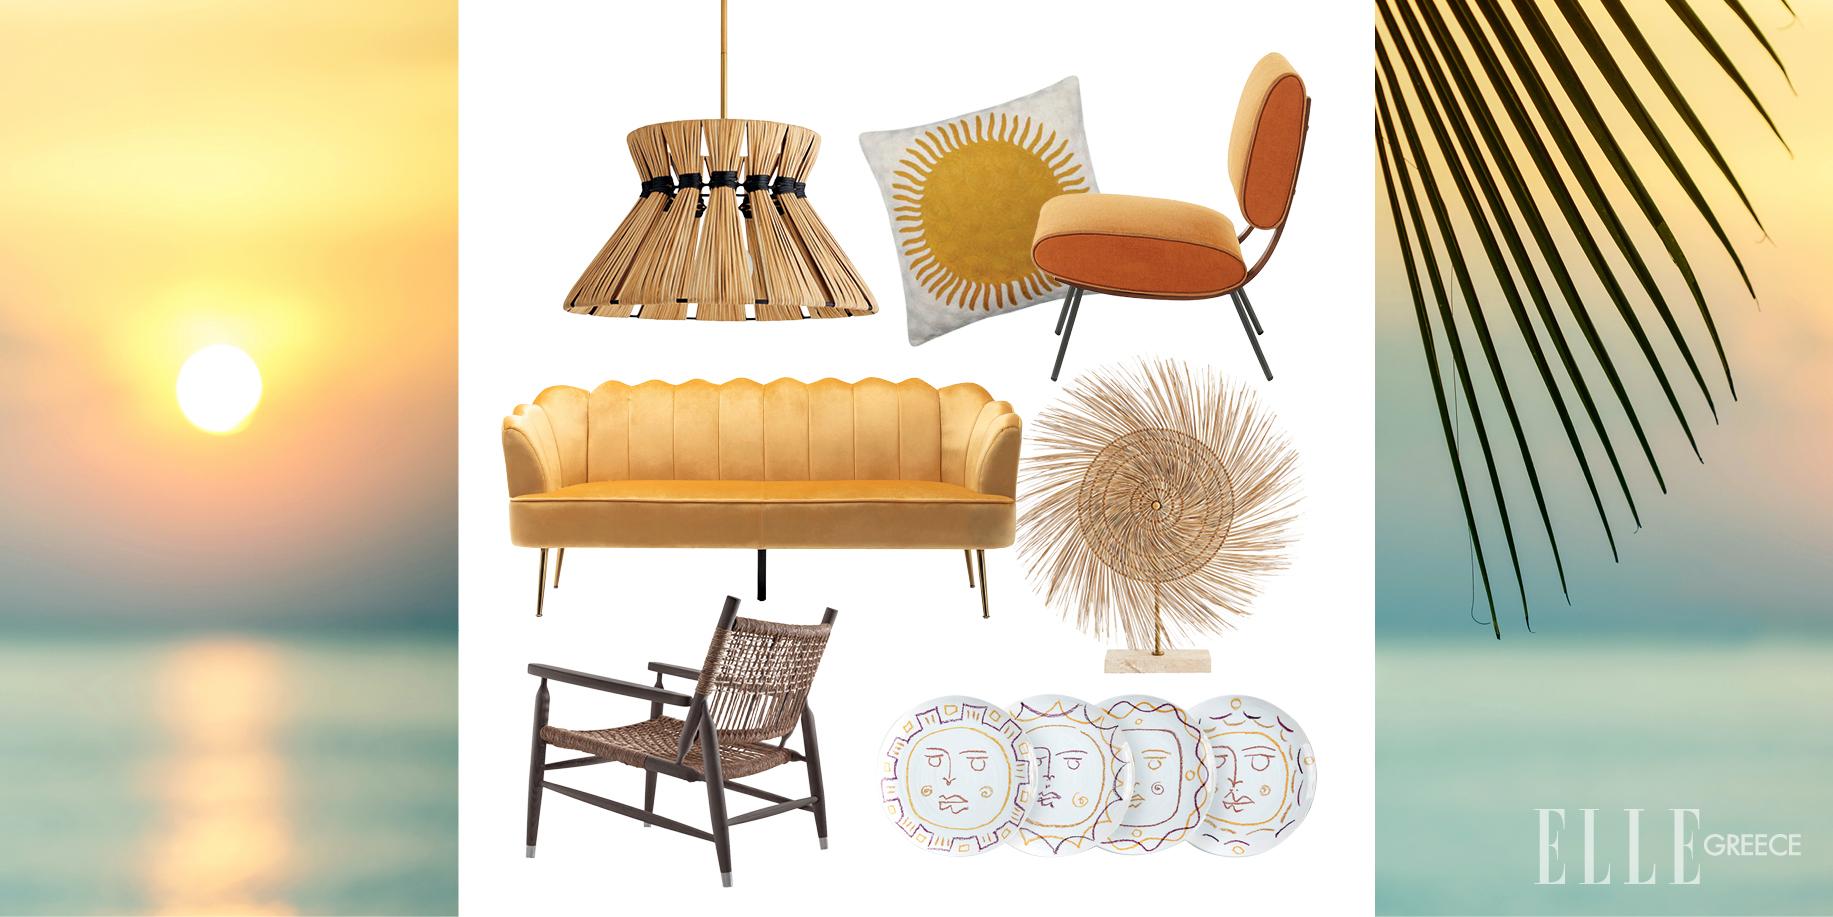 Under the Sun: Τα καλοκαιρινά vibes μένουν στο σαλόνι μας και το Σεπτέμβρη με αυτά τα 15 ξεχωριστά items